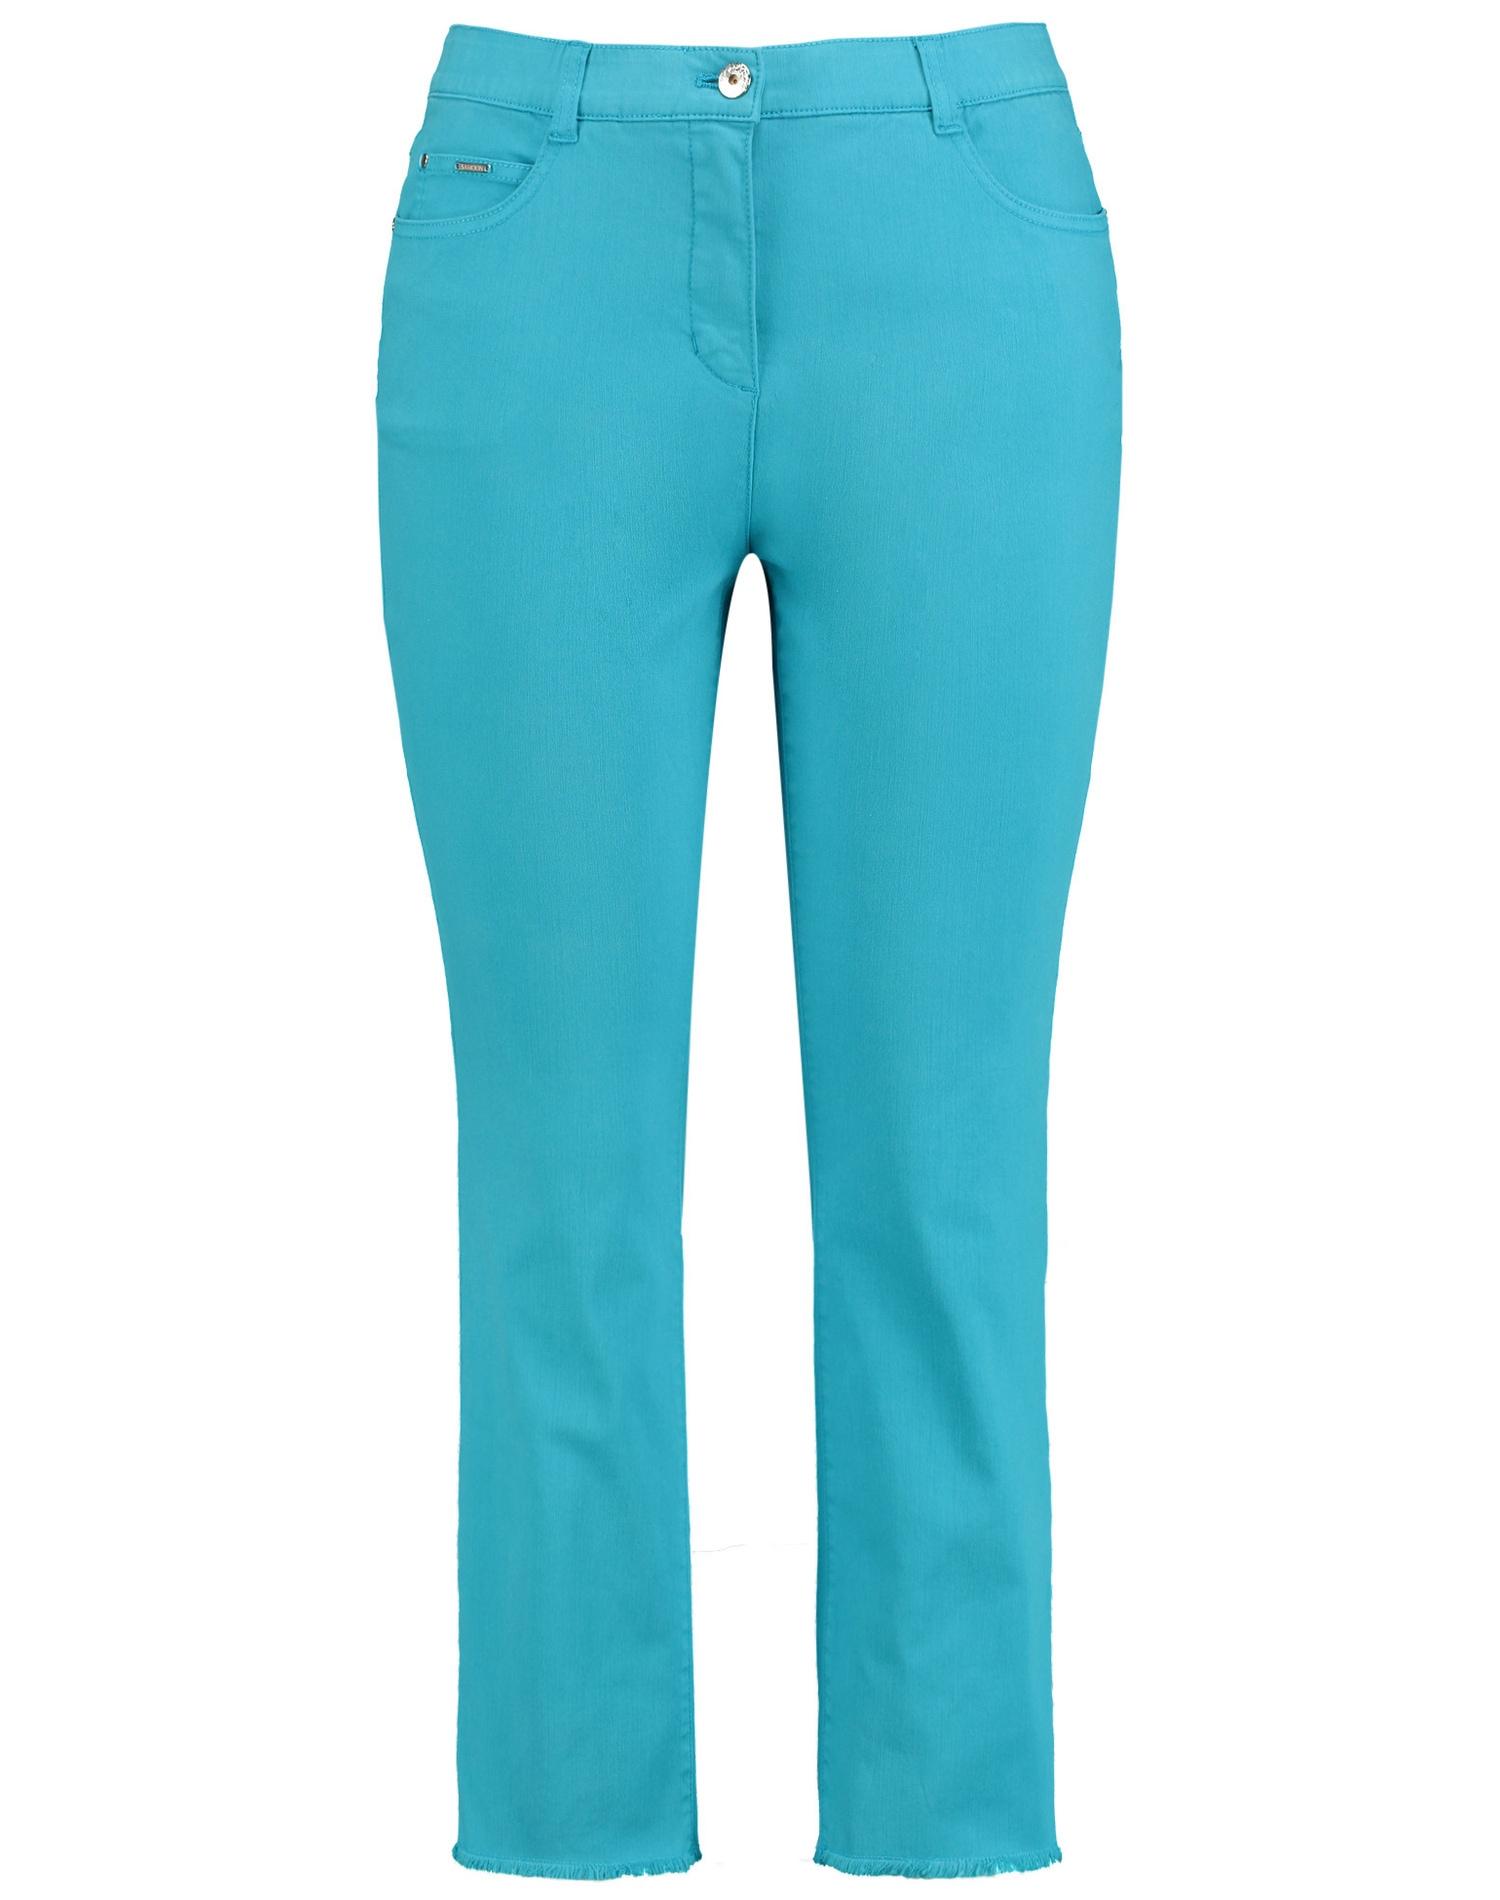 samoon -  Hose Freizeit verkürzt 7/8 Flared-Jeans Betty Jeans